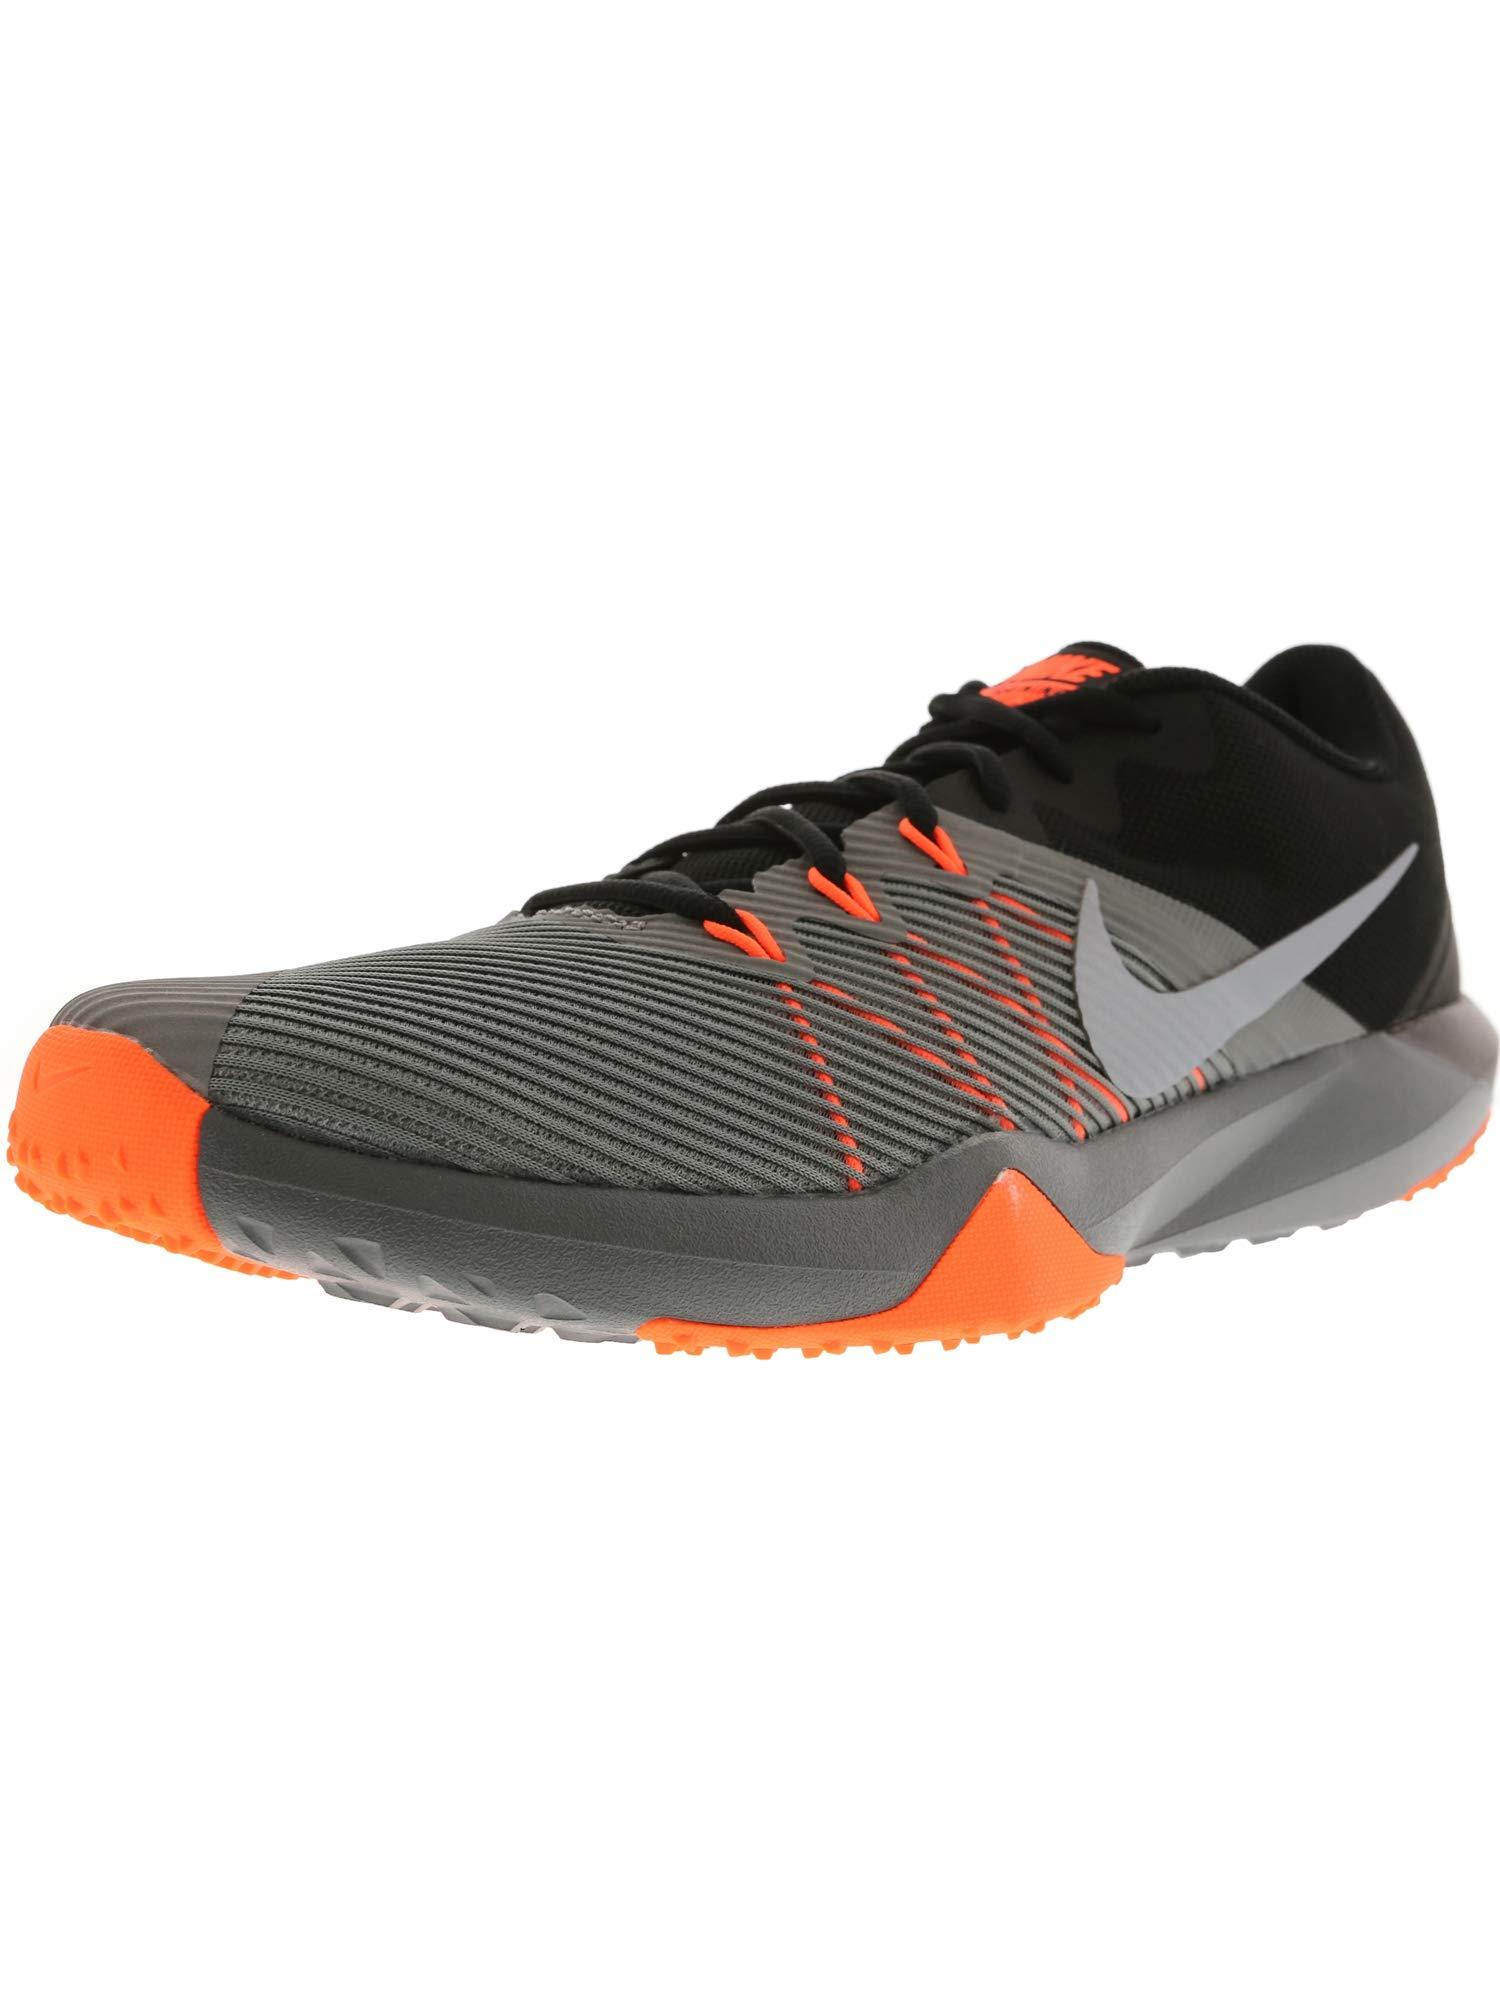 Nike Retaliation TR Men's Athletic Running Training Shoes Size 10.5